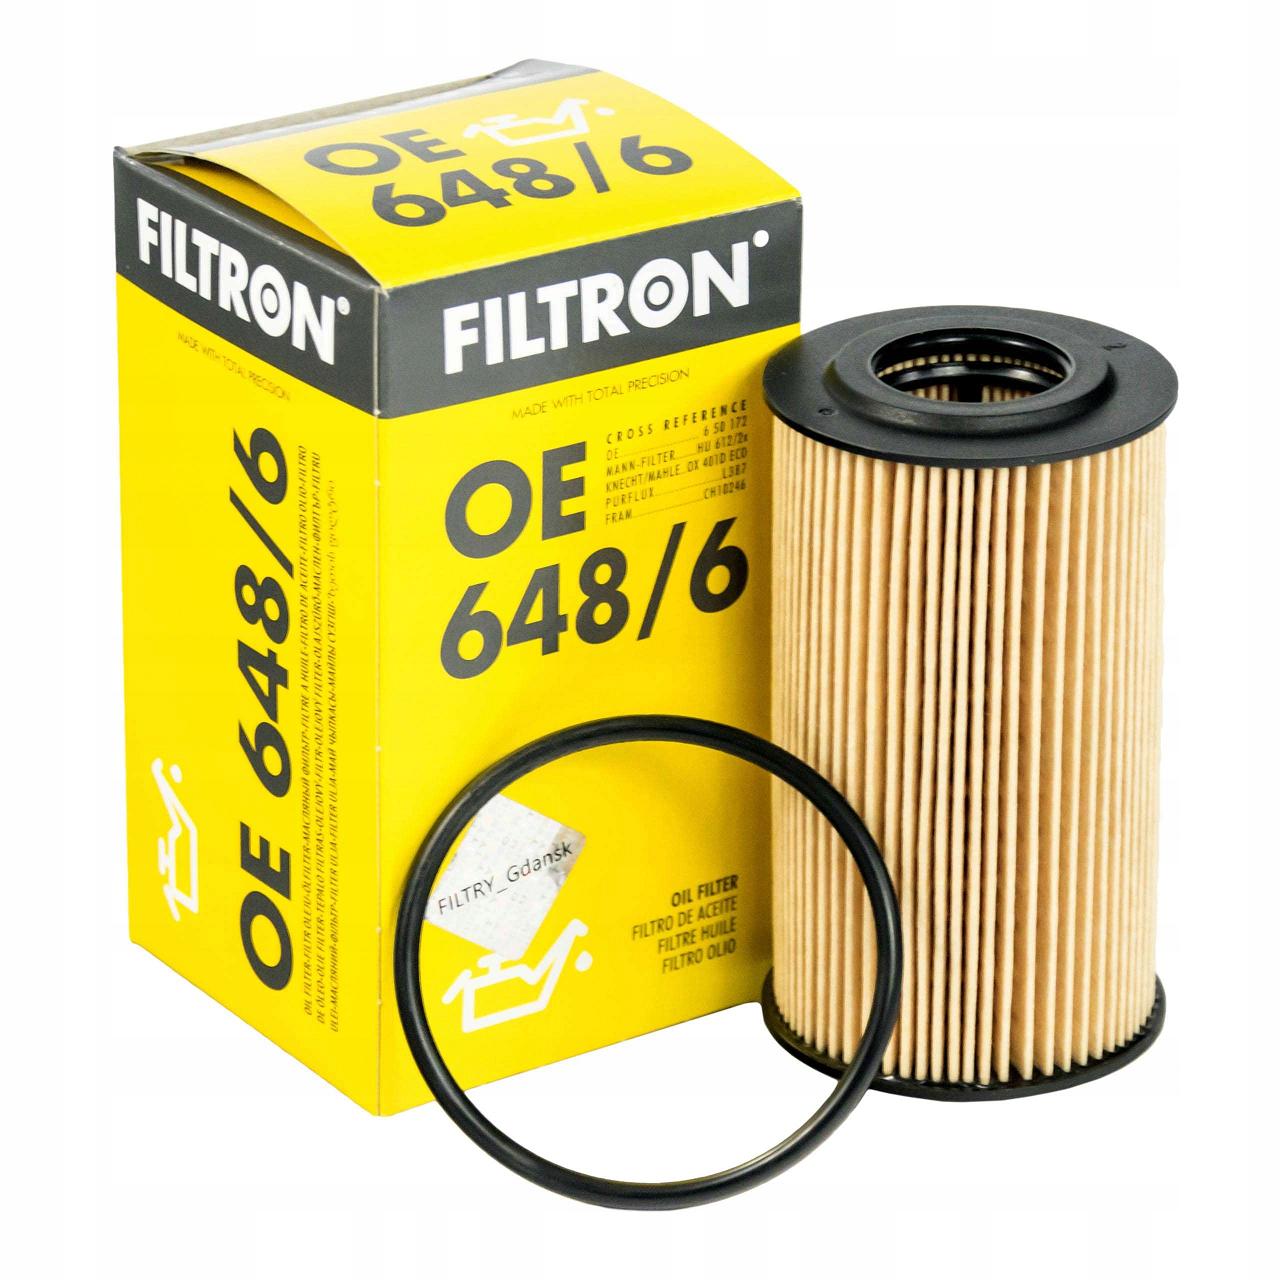 Opel Astra H 1.6 Yağ Filtresi Filtron